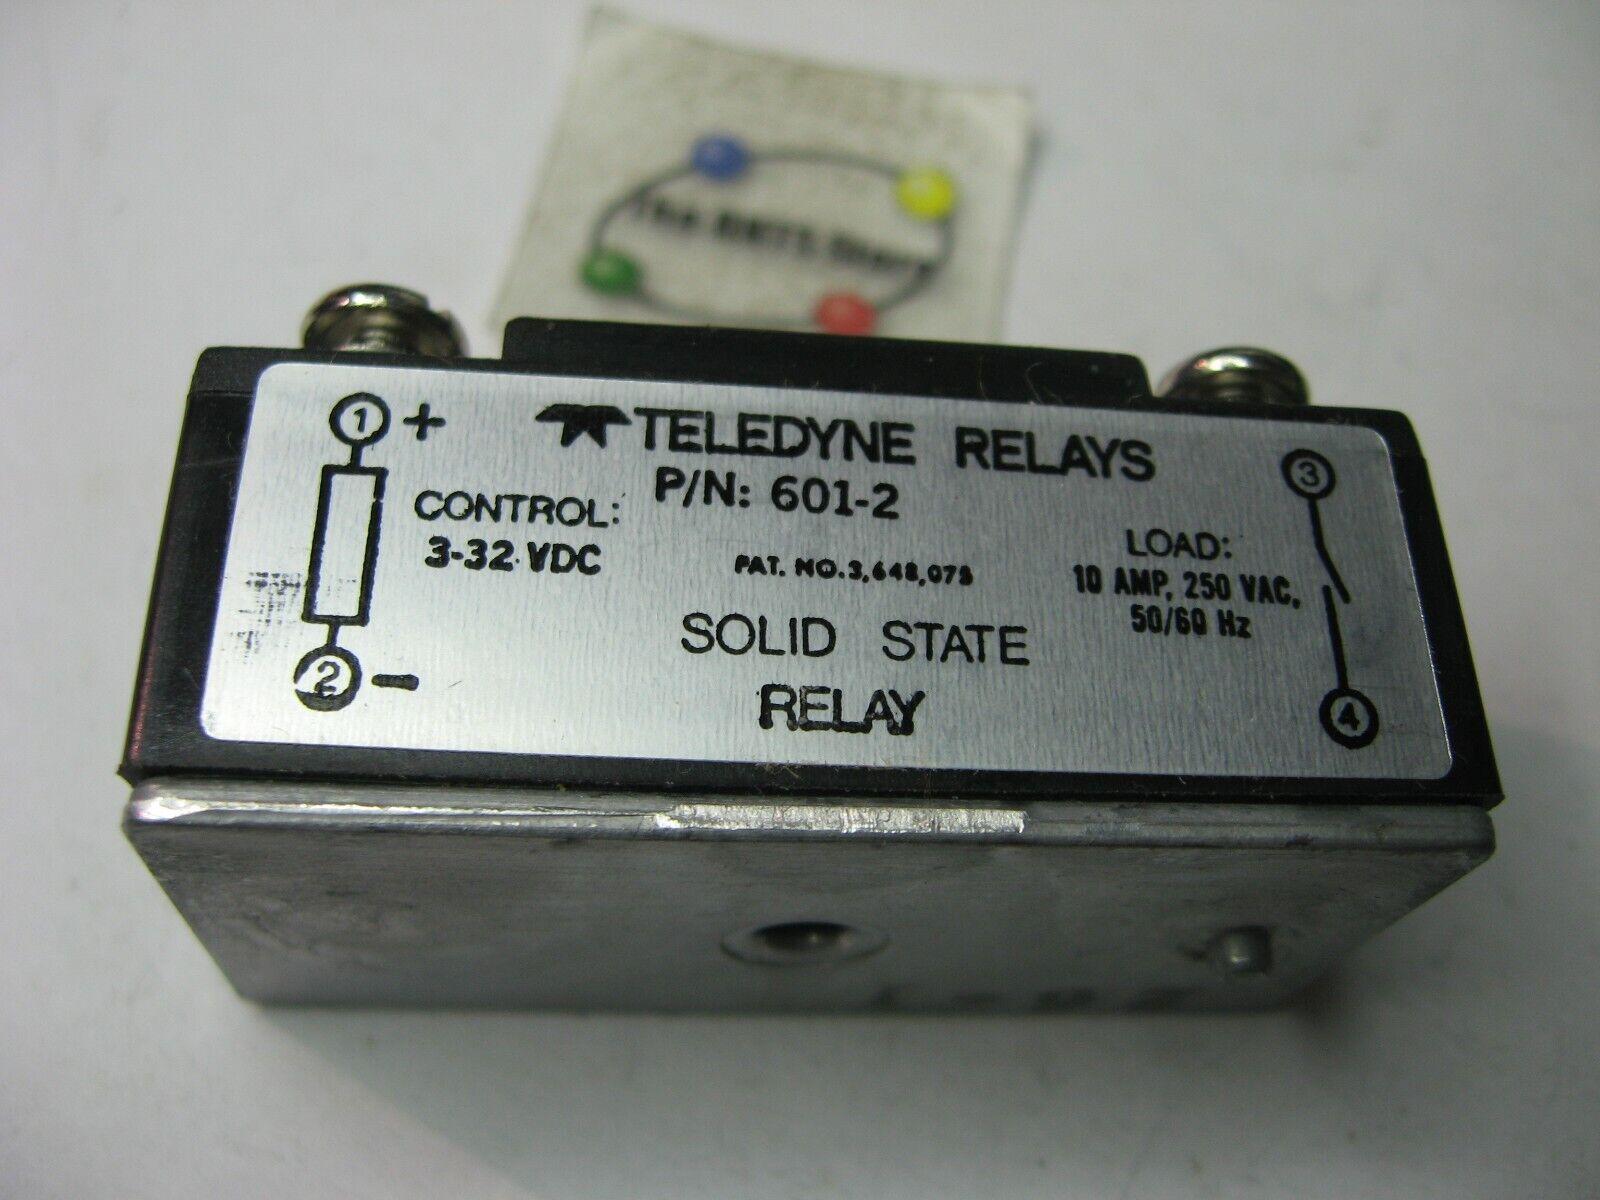 Teledyne SSP 601-2 Solid State Relay 3-32VDC 250VAC